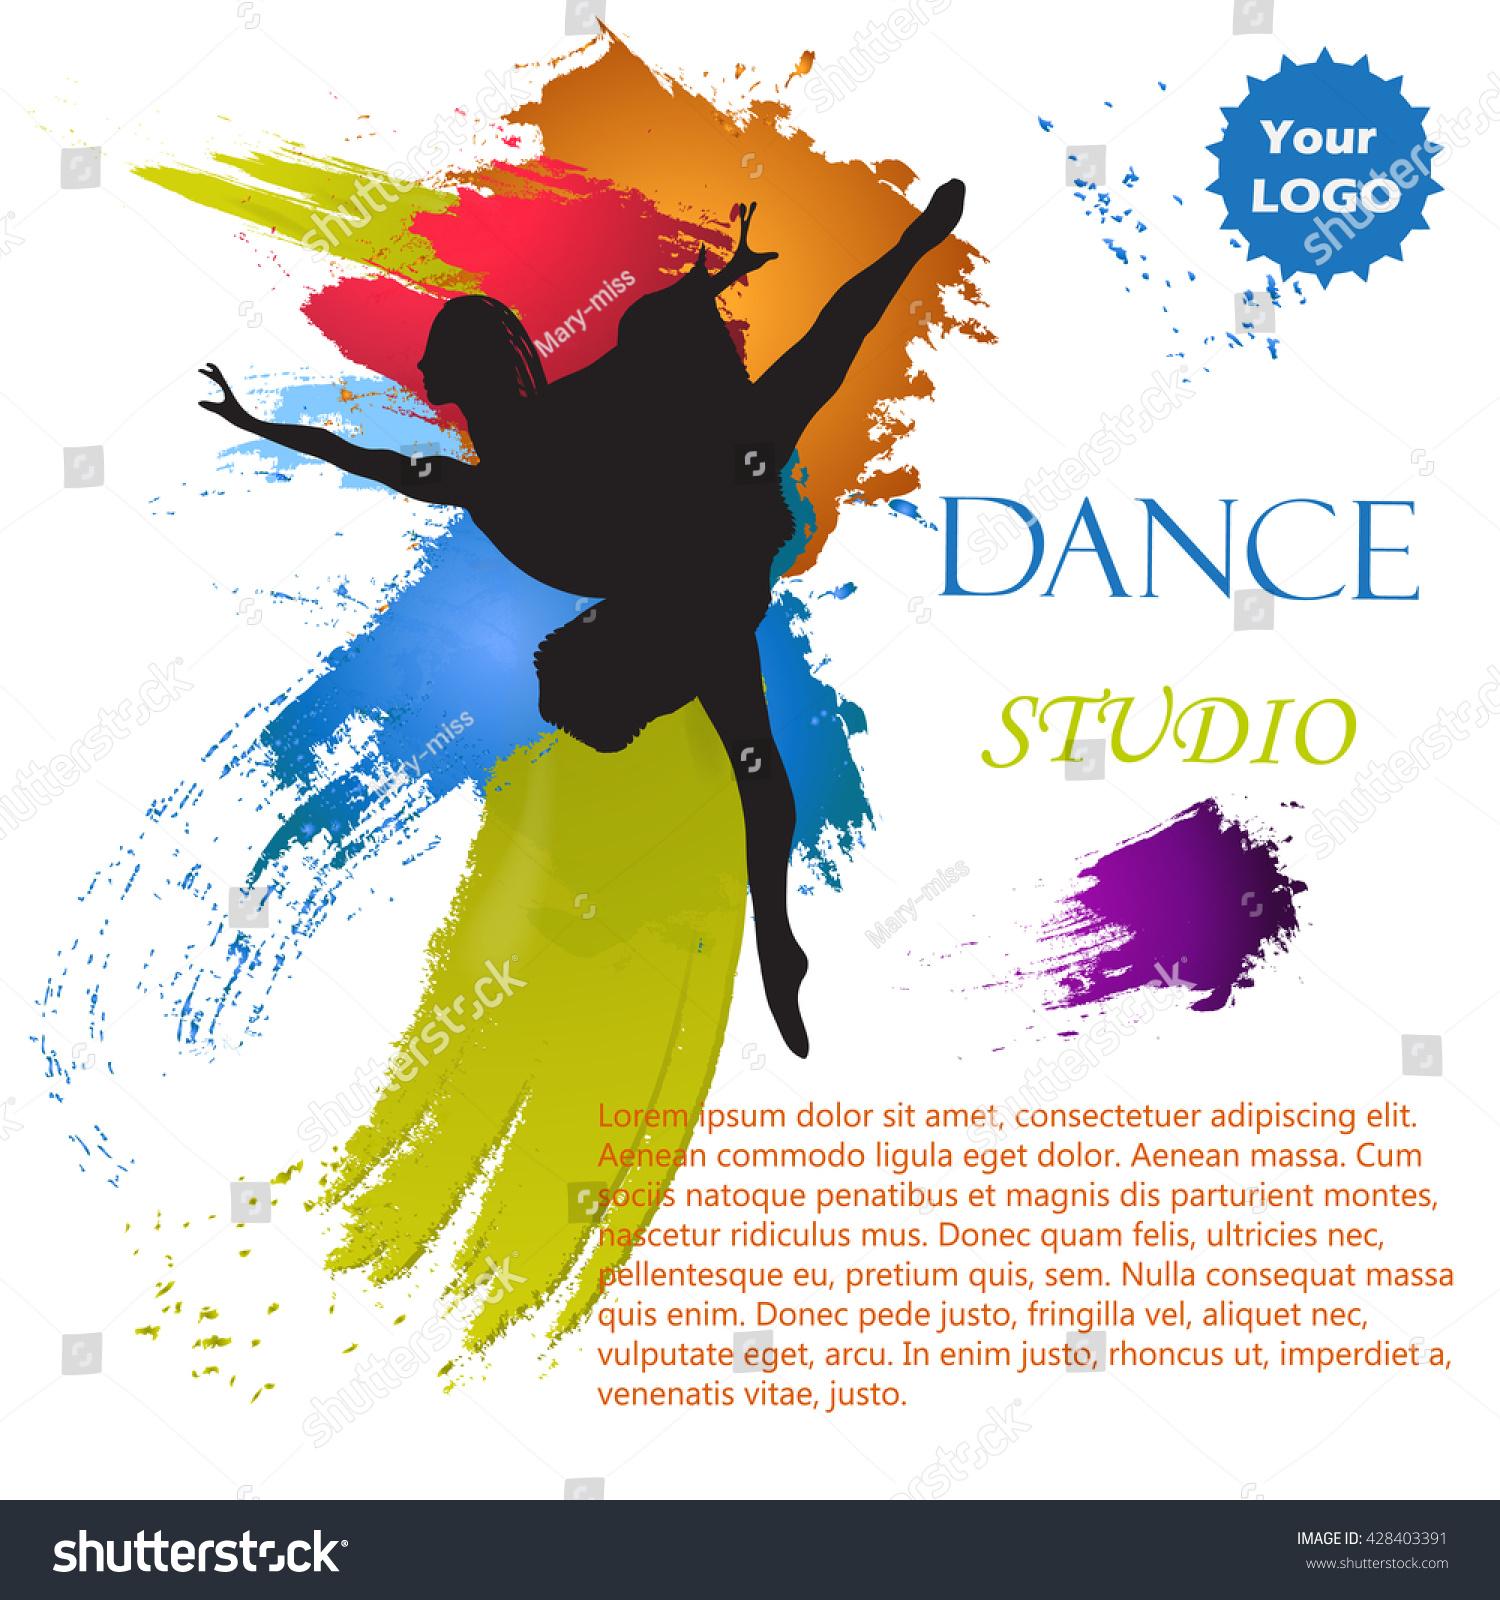 Vector Illustration Dance Studio Suitable For Billboards Posters Booklets Postcards